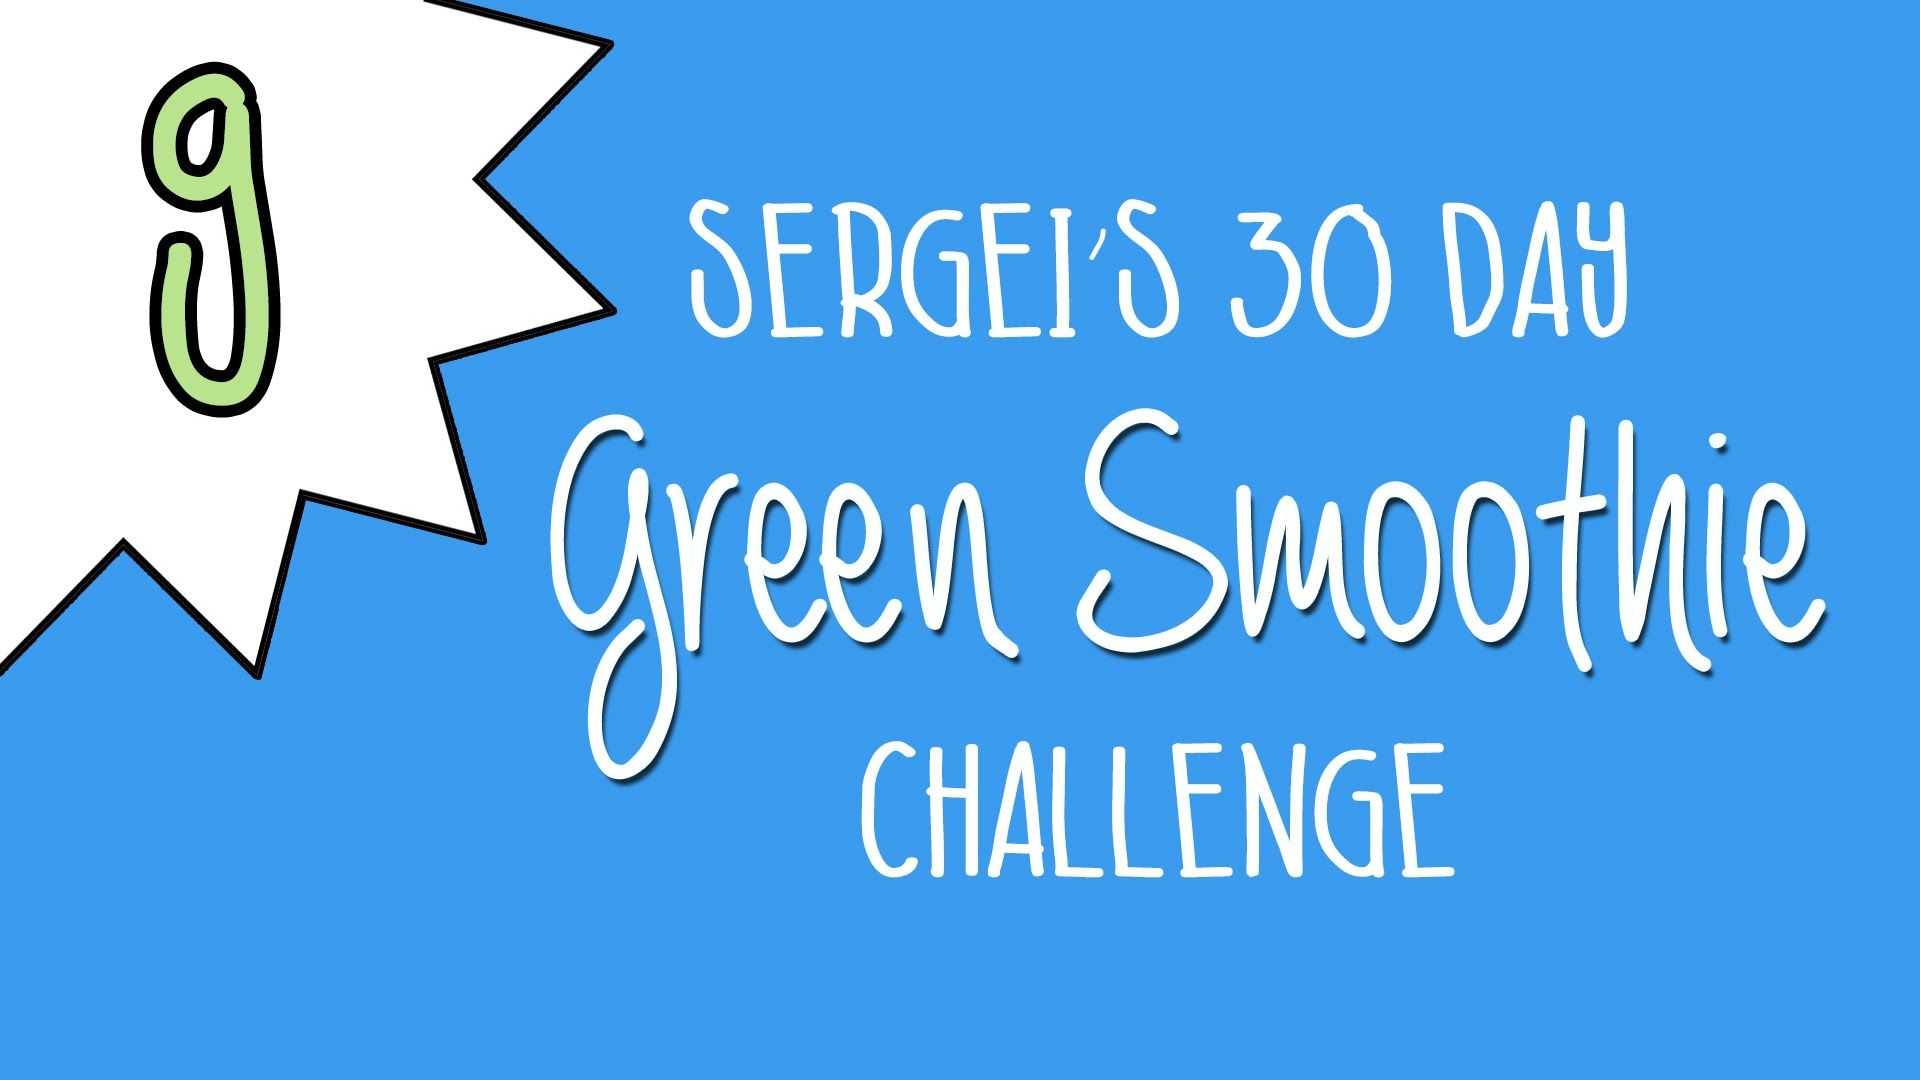 Green Smoothie Challenge Day 9 (budget green smoothie) #greensmoothiechallenge, #greensmoothie, #healthy, #newyearsresolution, #greens, #green, #greendrink.